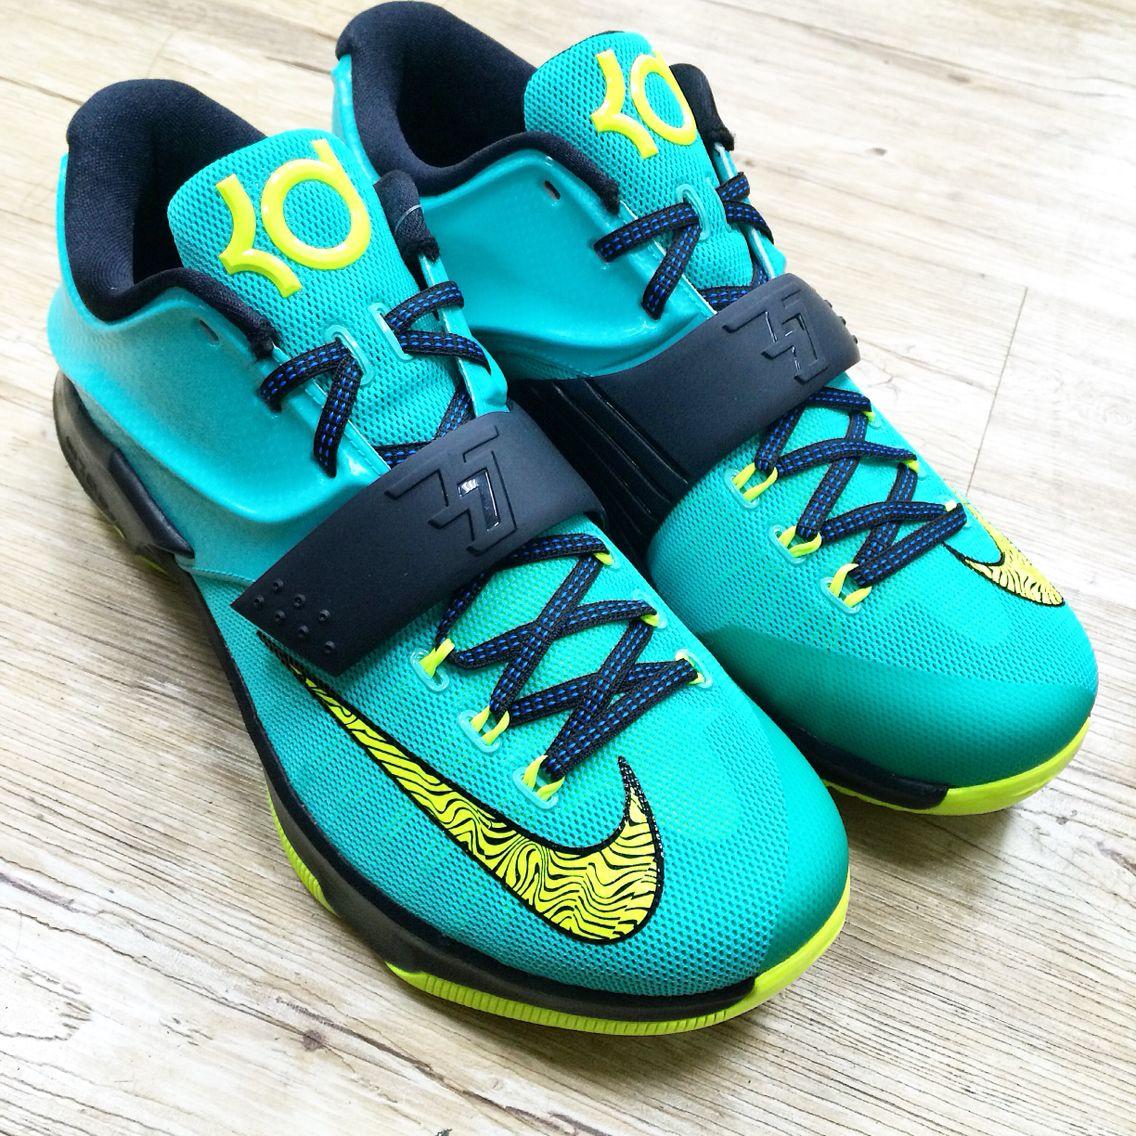 ... nike kd vii ep 7 uprising kevin durant zoom air max 2014 mens  basketball shoes